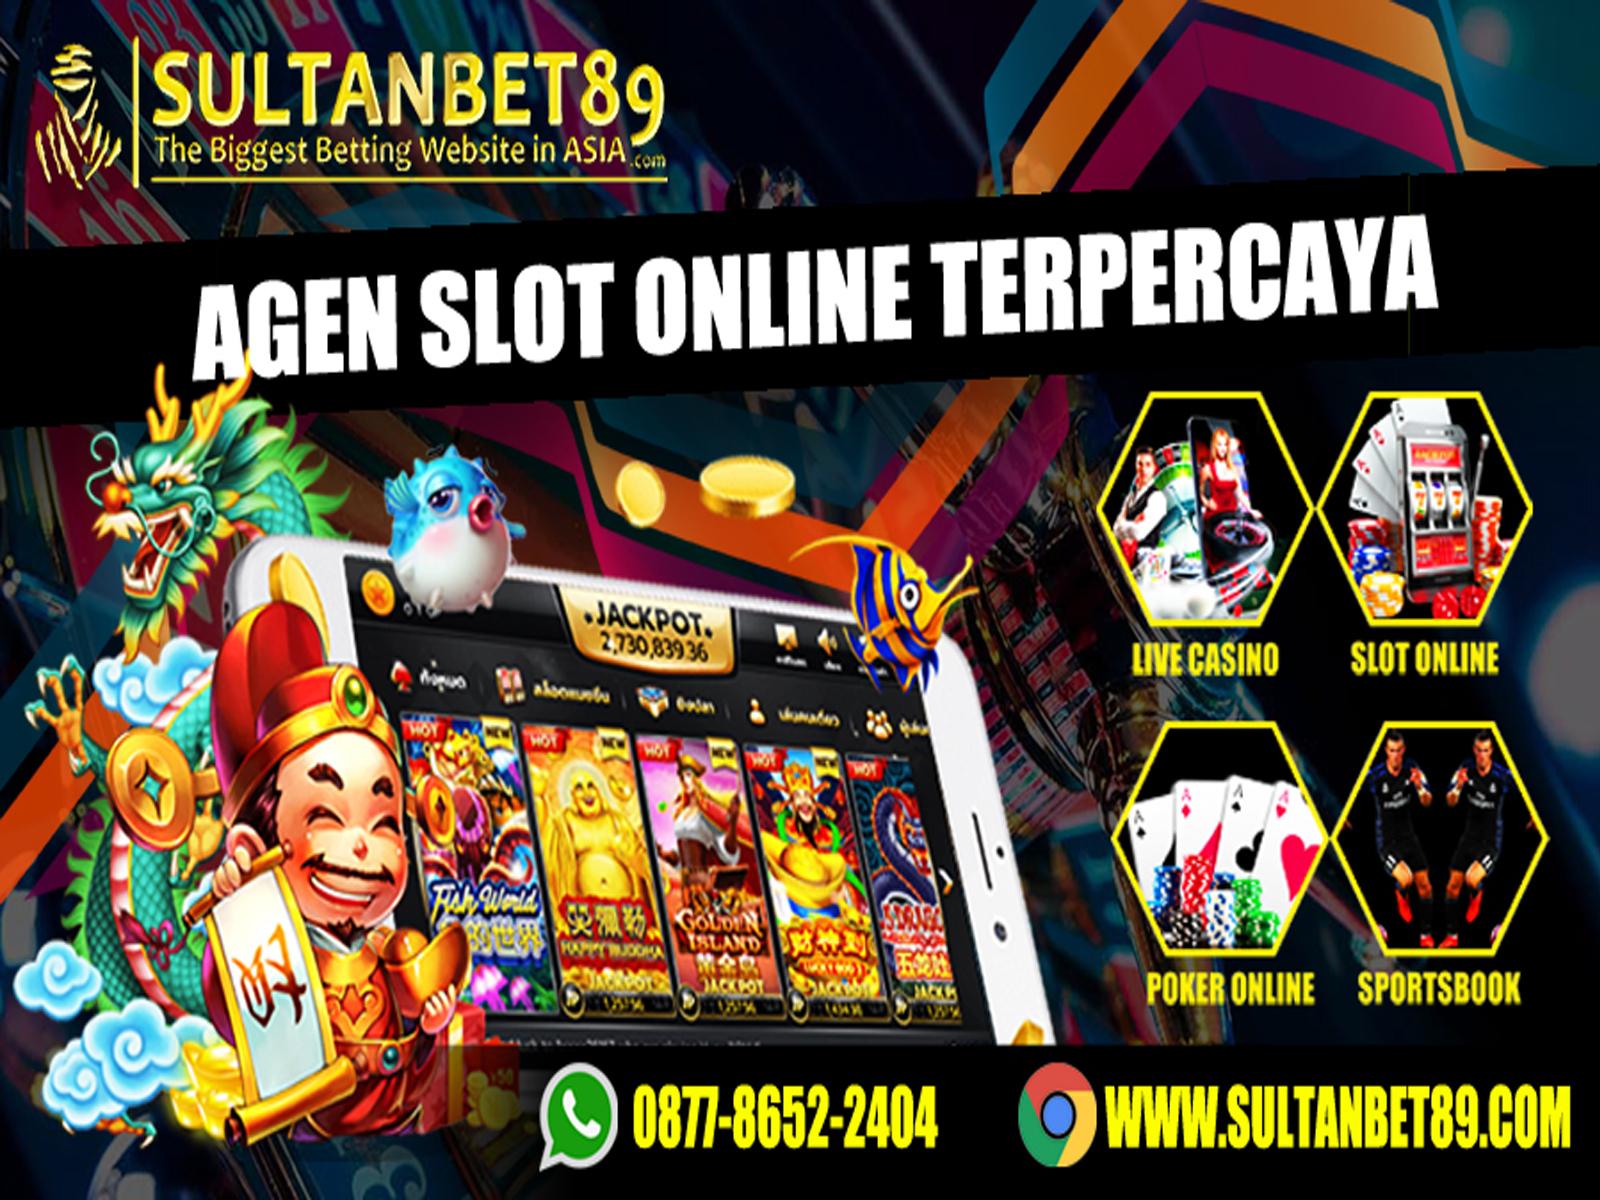 Slot Online Deposit Pulsa Tanpa Potongan By Slot Online Deposit Pulsa Tanpa Potongan On Dribbble